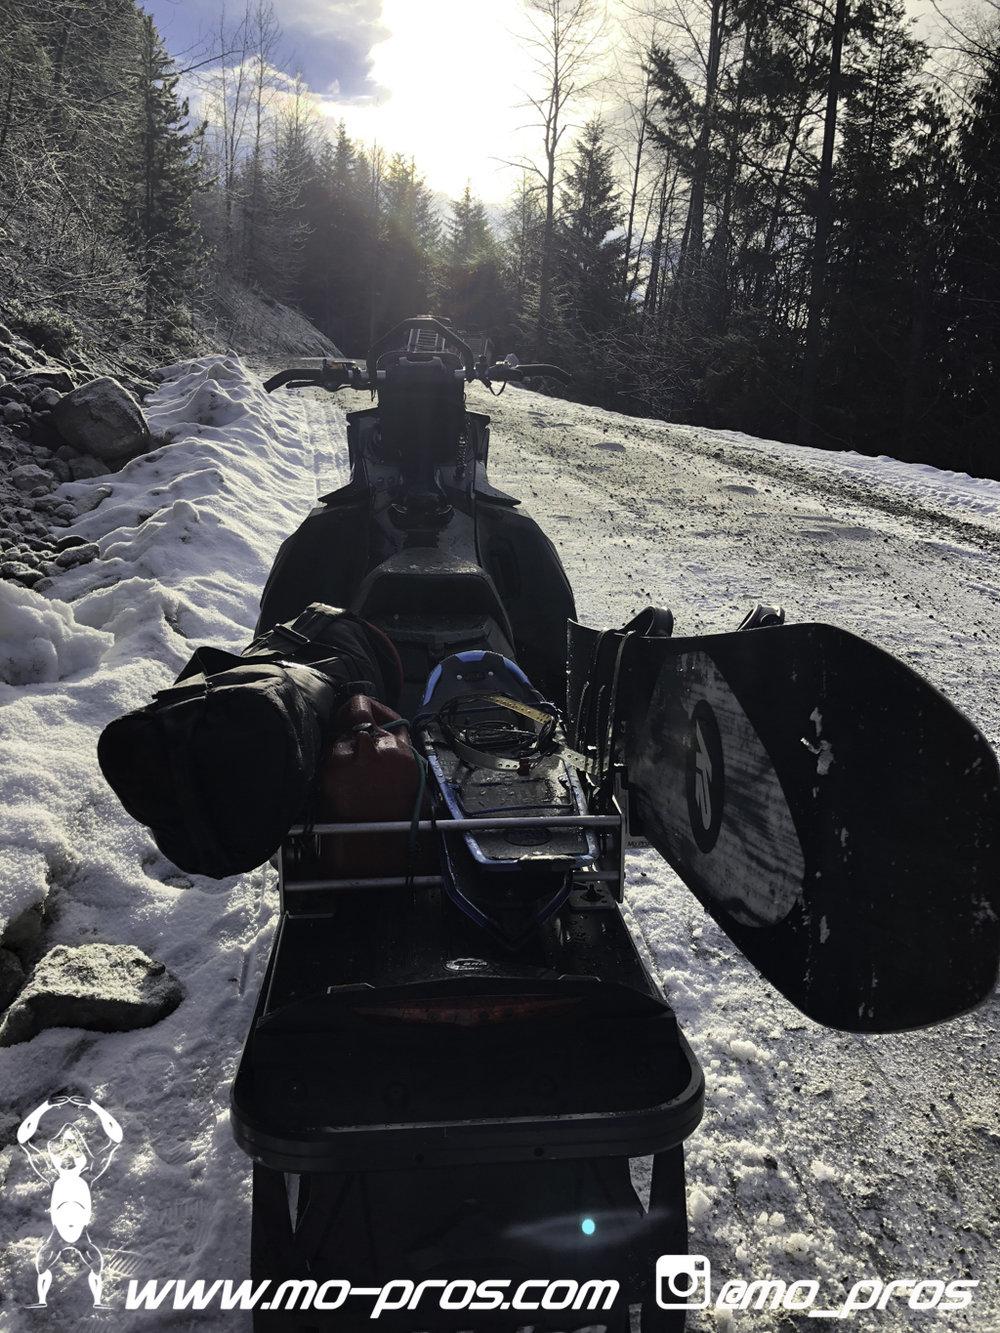 12_Tsaina Rack_Timbersled rack_Timbersled Rack_timbersled bag_snowmobile bag_Snowmobile_Snowboarding_Snowboard rack_snowboard_Snowbike_Ski_Rack_LinQ Snowboard Ski_Gun Rack_Gear_gas Rack_Cheetah Facto.jpg